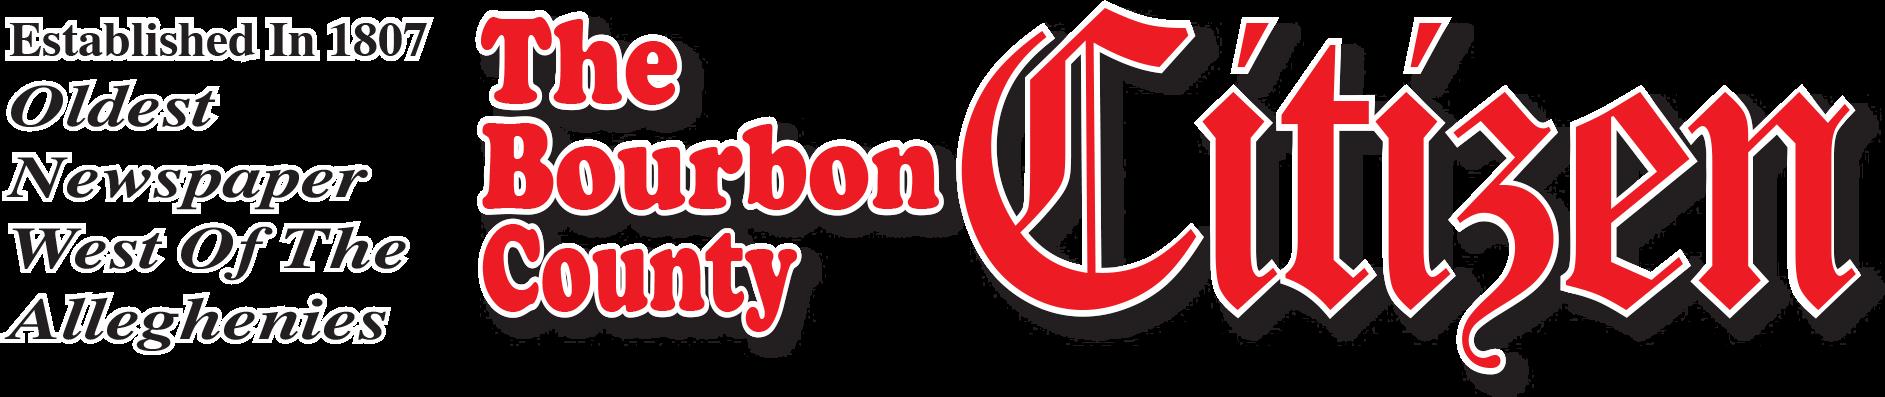 The Bourbon County Citizen